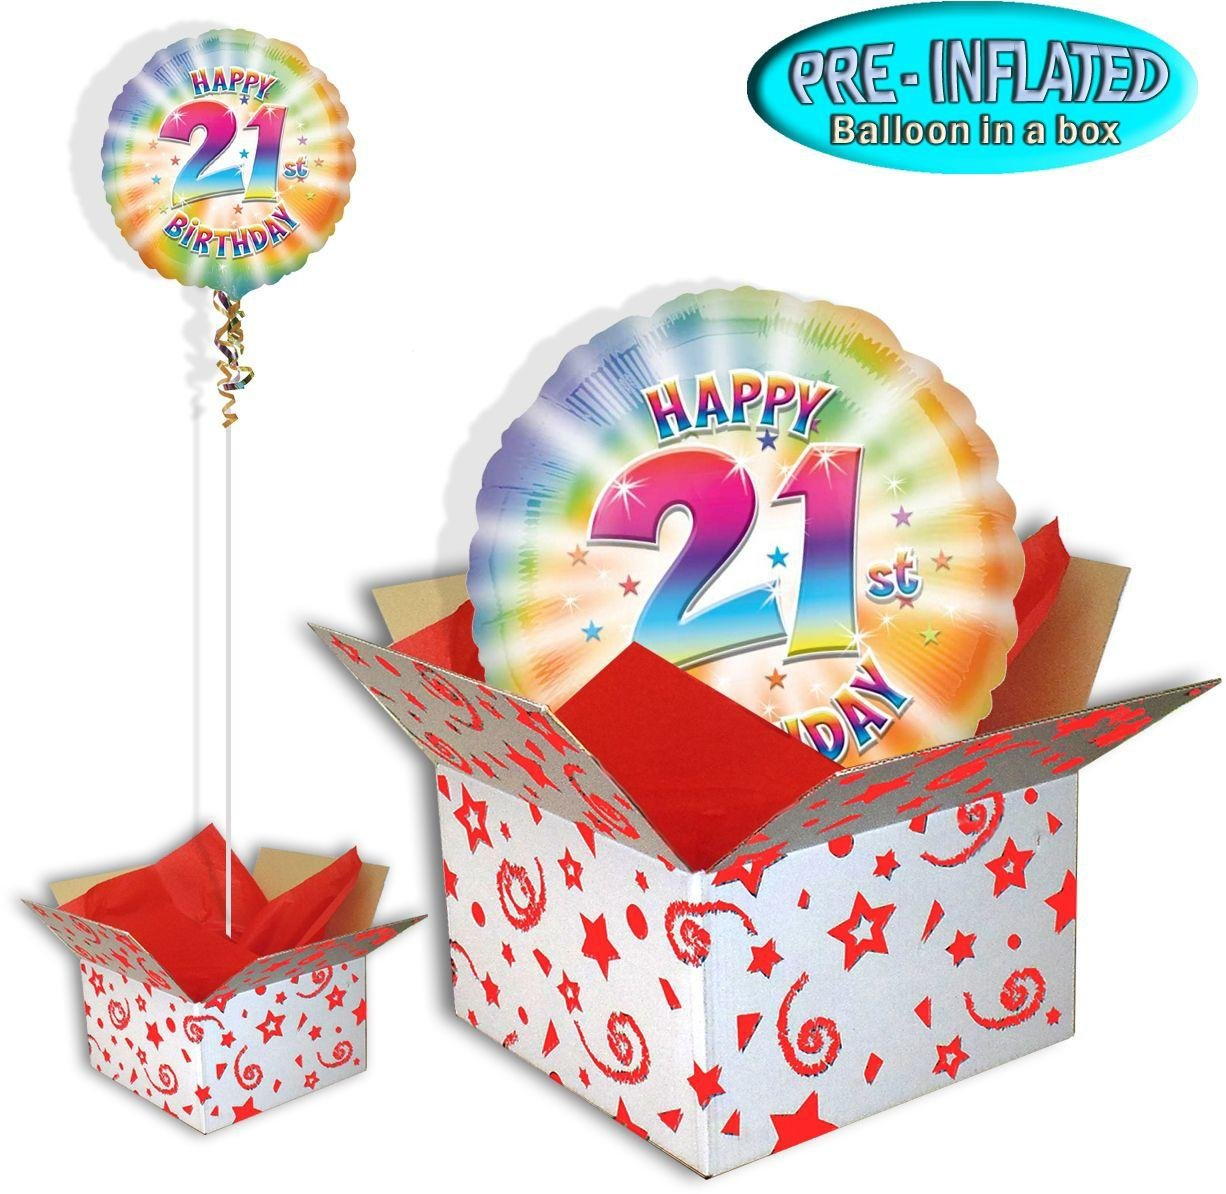 Happy 21st Birthday Balloon In A Box 2448189